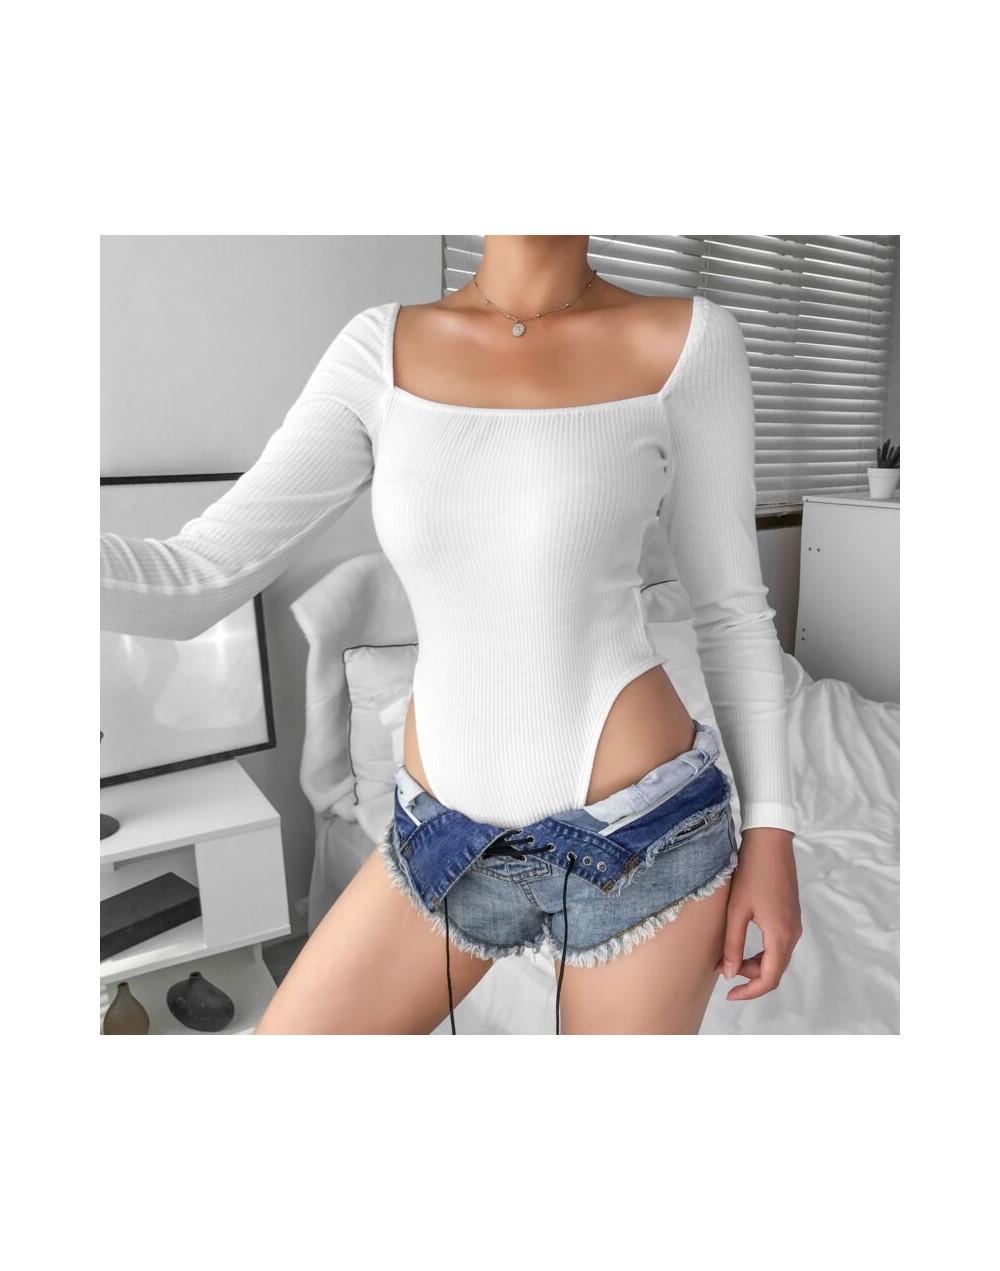 2019 New Autumn Sexy Women Long Sleeve Shirt Romper Casual Sling Stretch Leotard jumpsuit Bodysuit - 56111226699473